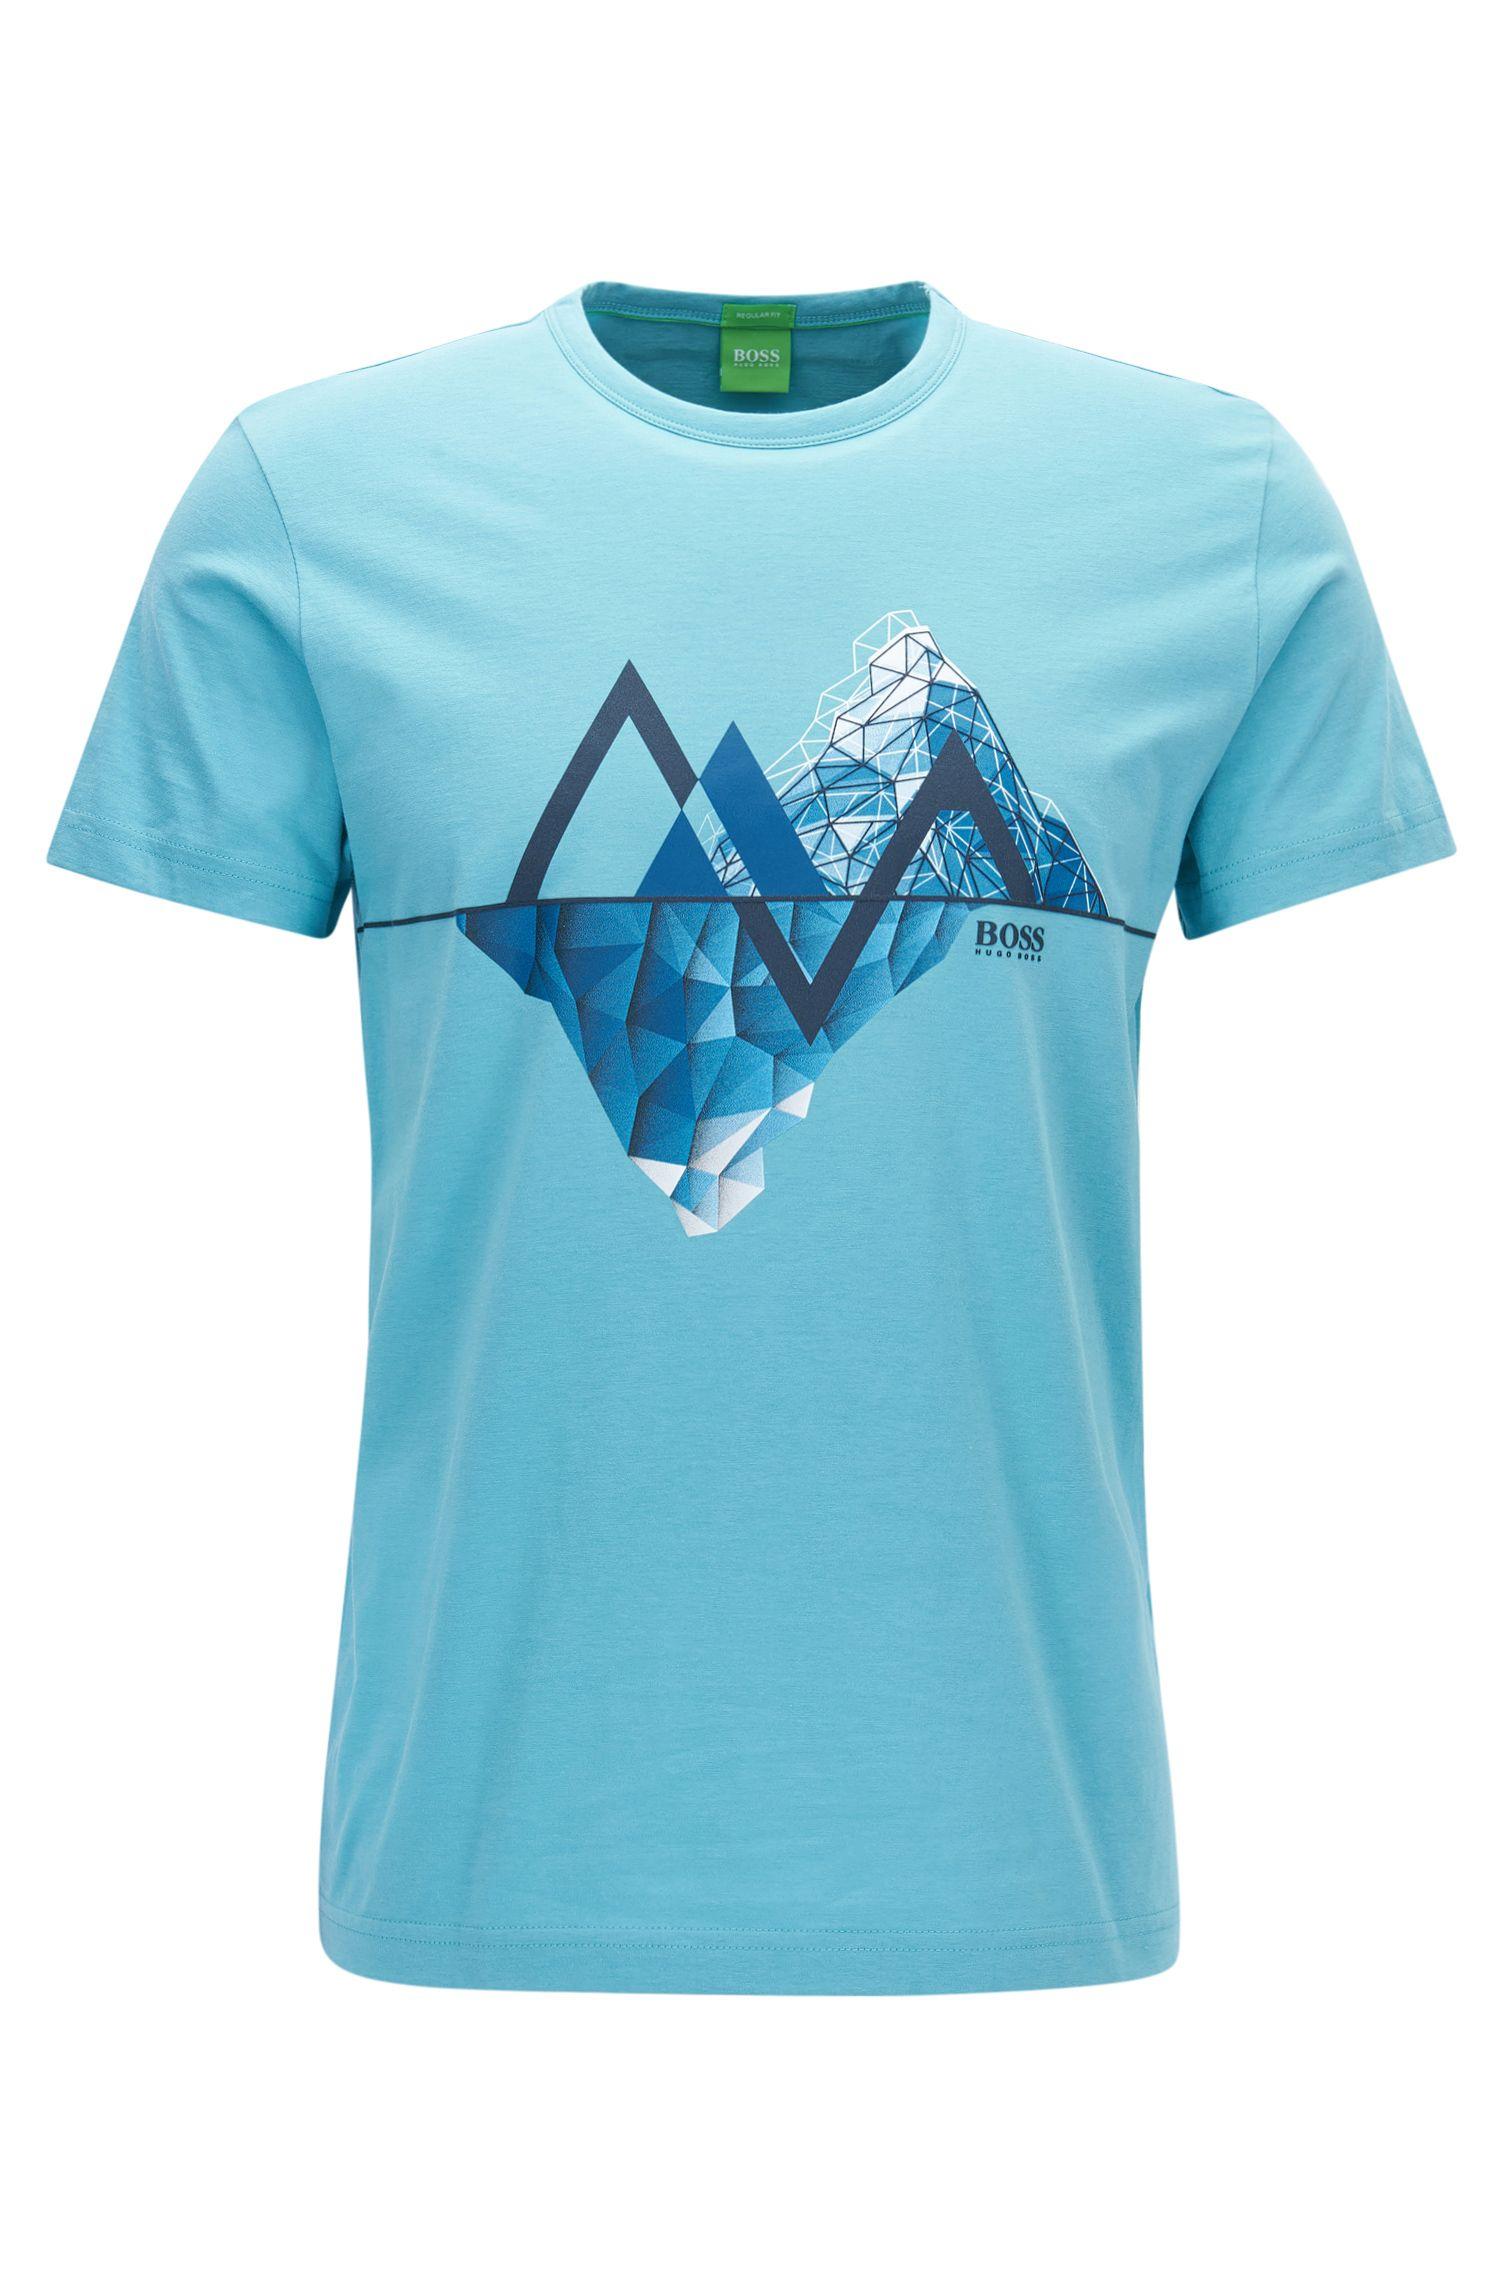 Cotton Graphic T-Shirt | Tee